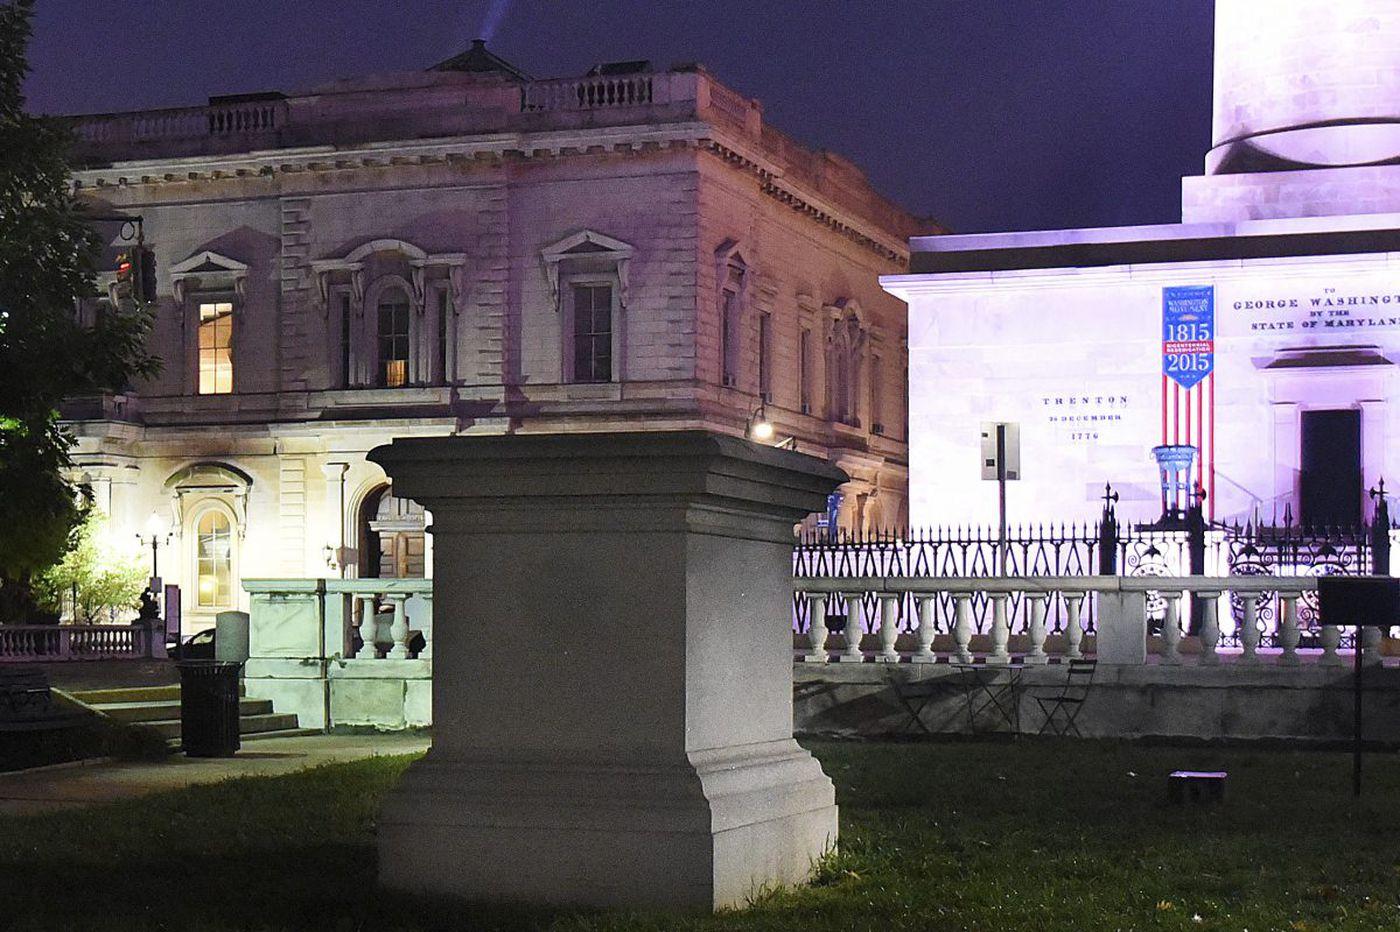 Philadelphia street has a Civil War-era link: Who was Roger Taney?